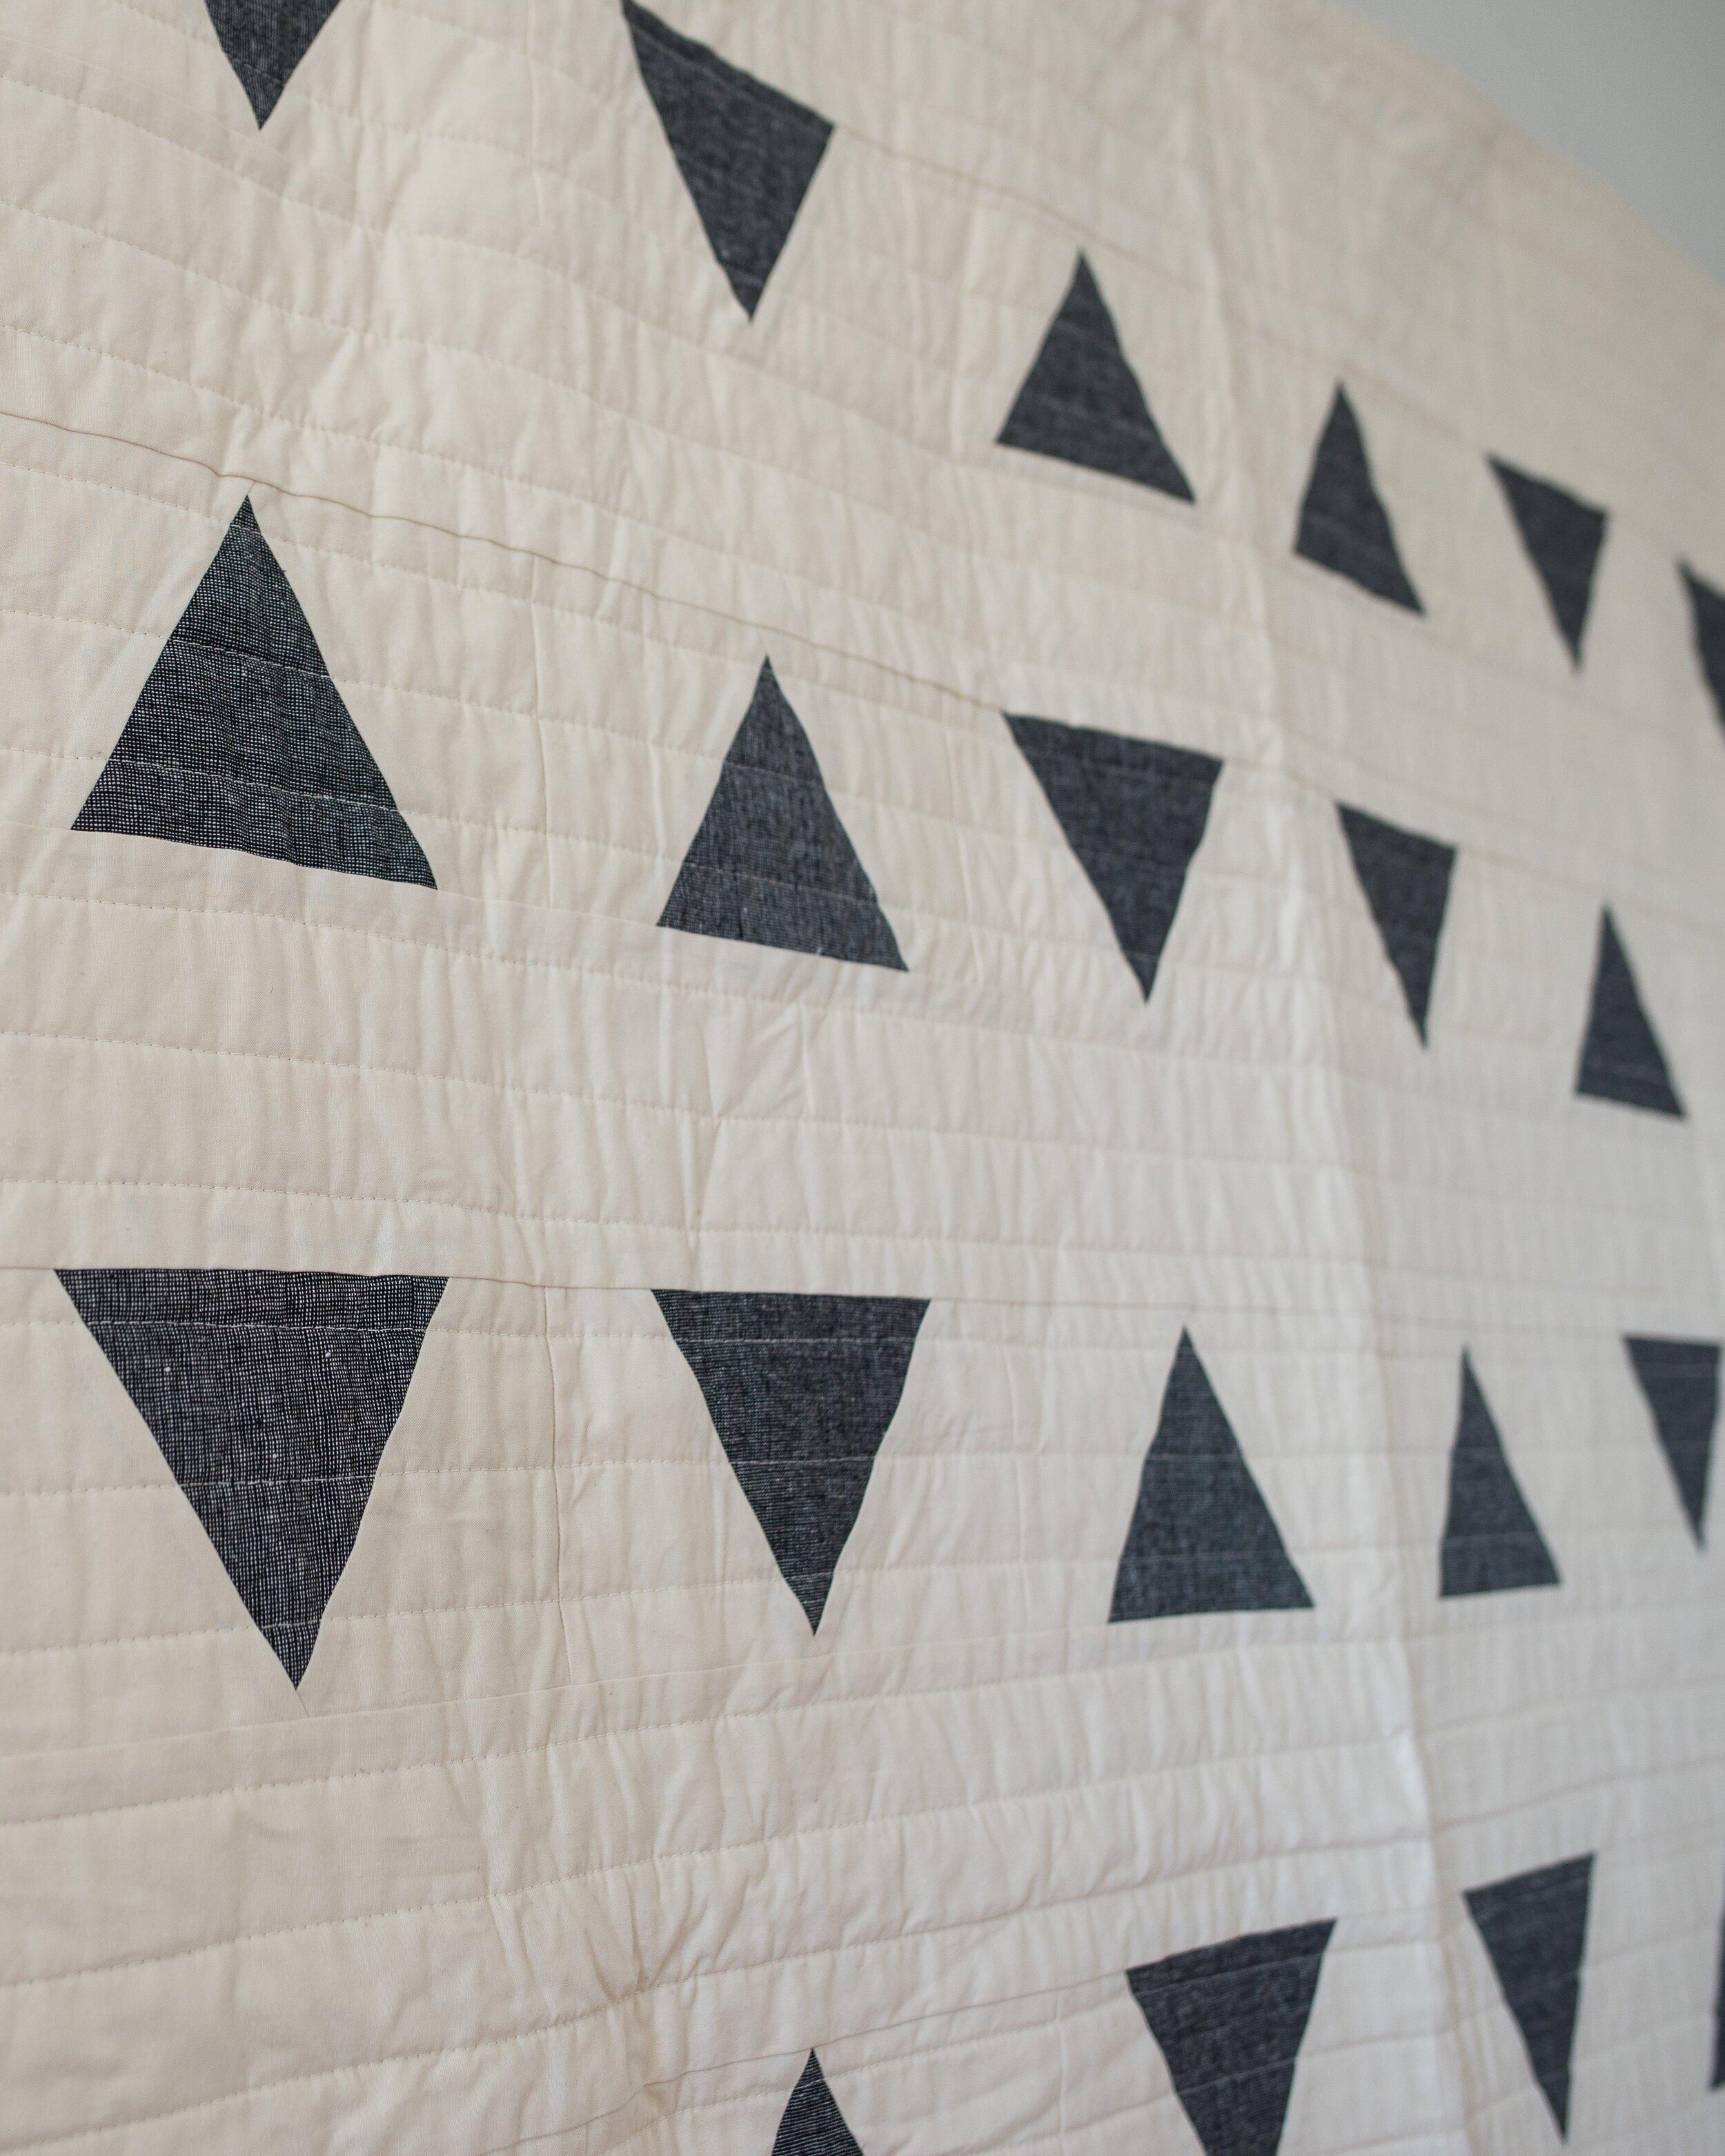 2019 Black Essex Triangles4.jpg